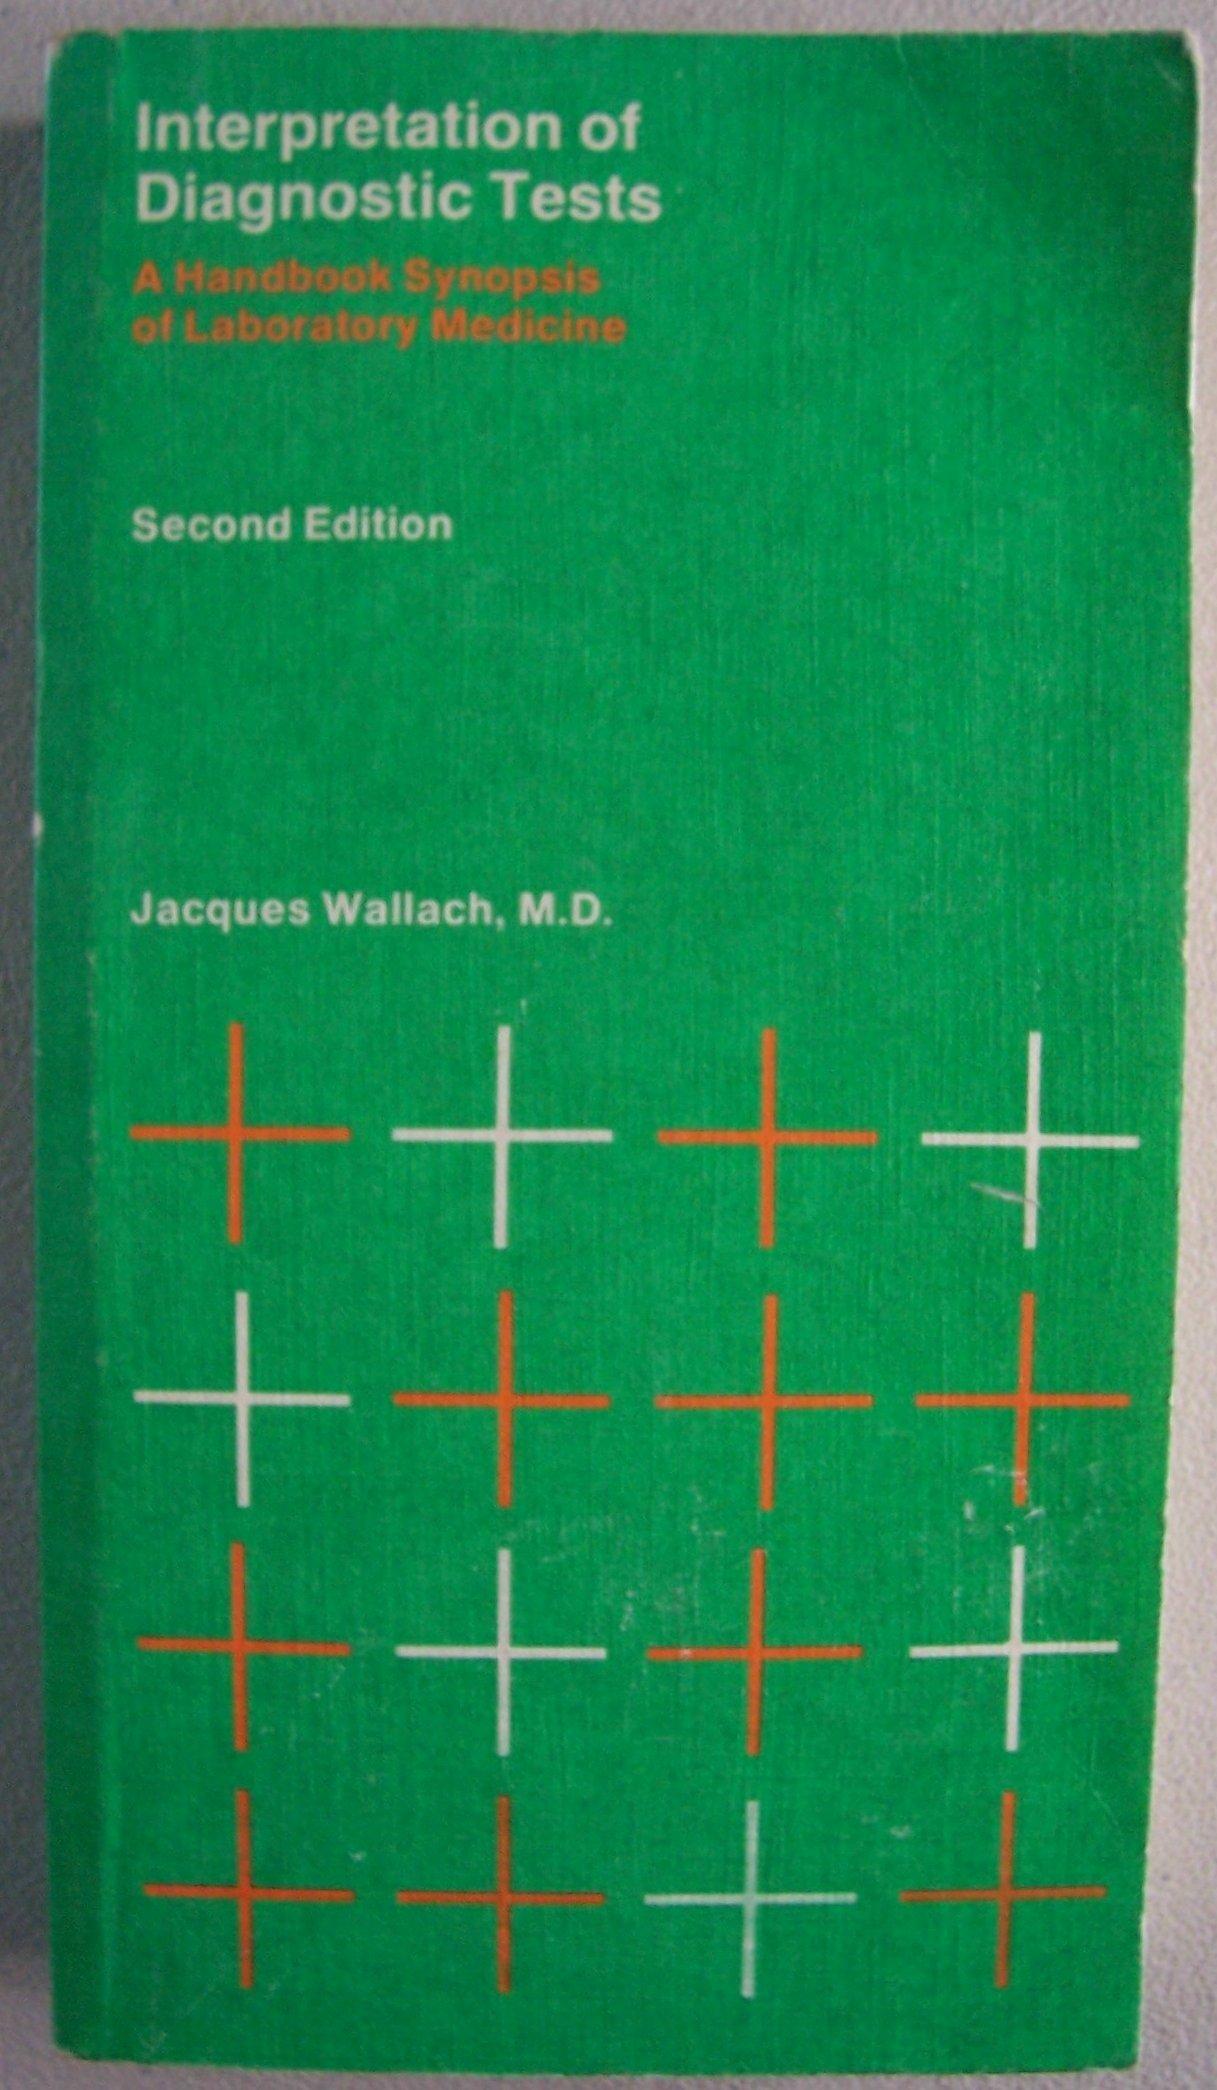 interpretation of diagnostic tests a synopsis of laboratory medicine